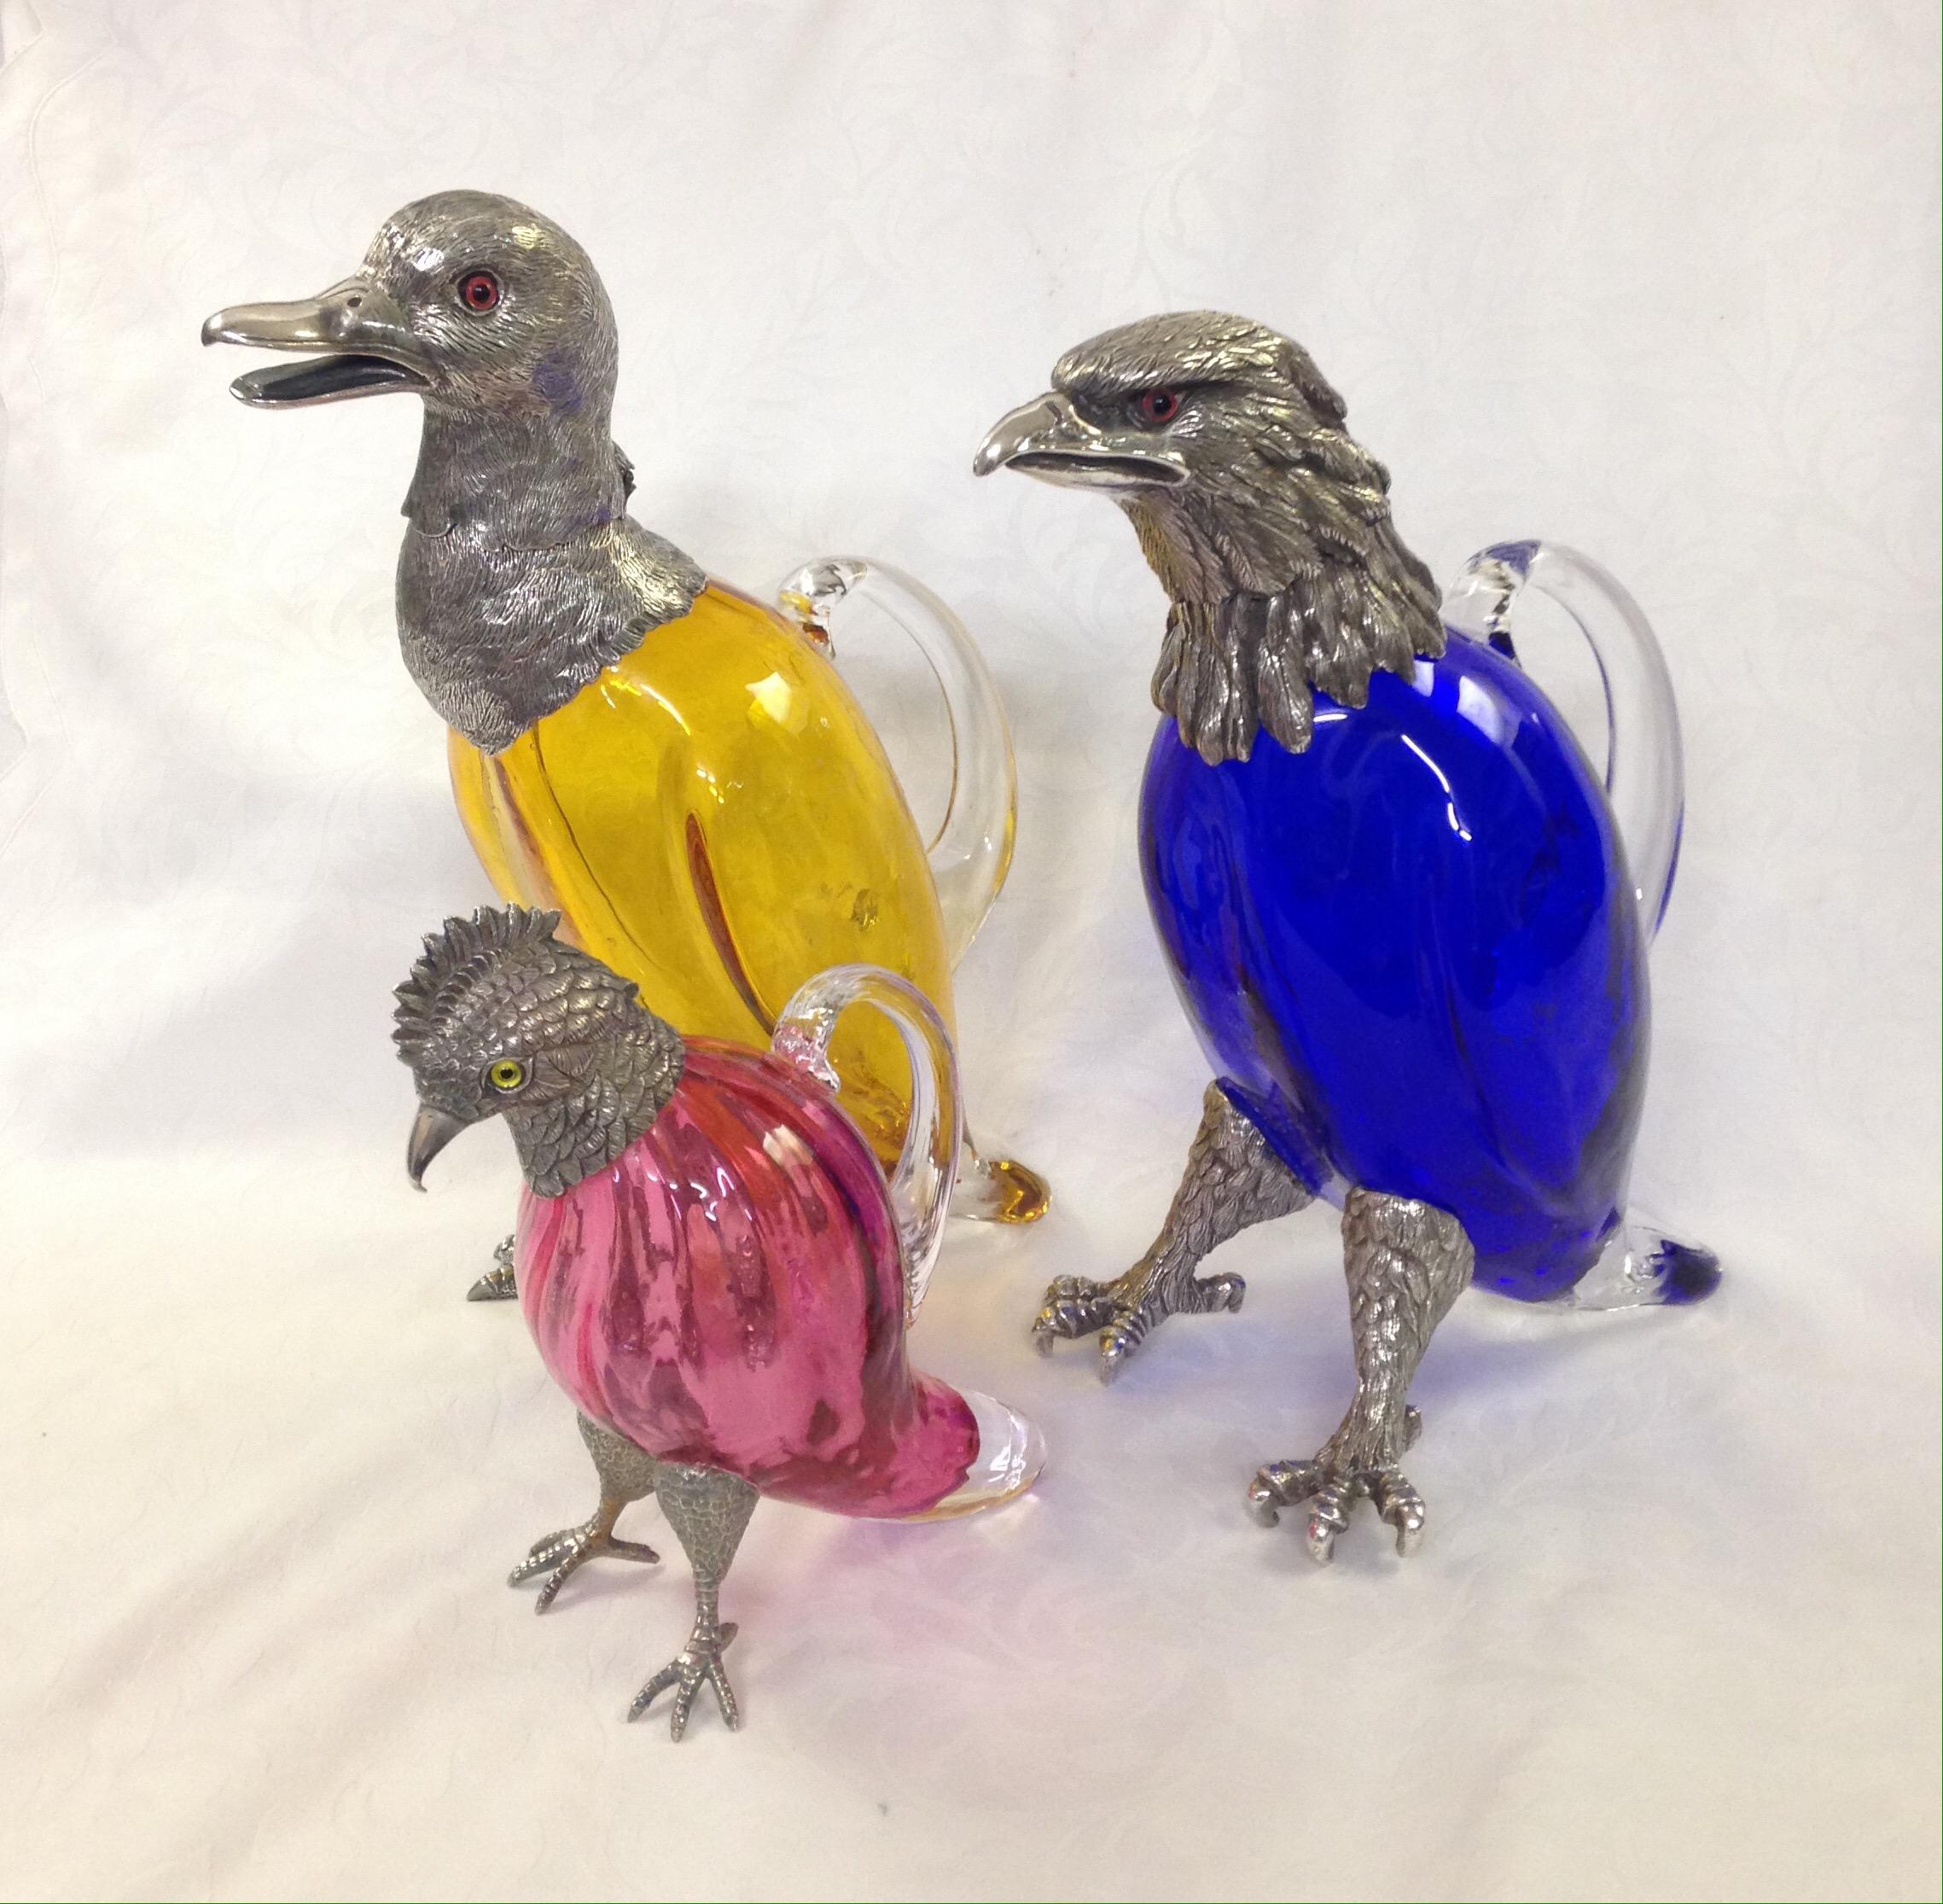 Silver duck decanter silver parrot decanter silver bird decanter with coloured glass